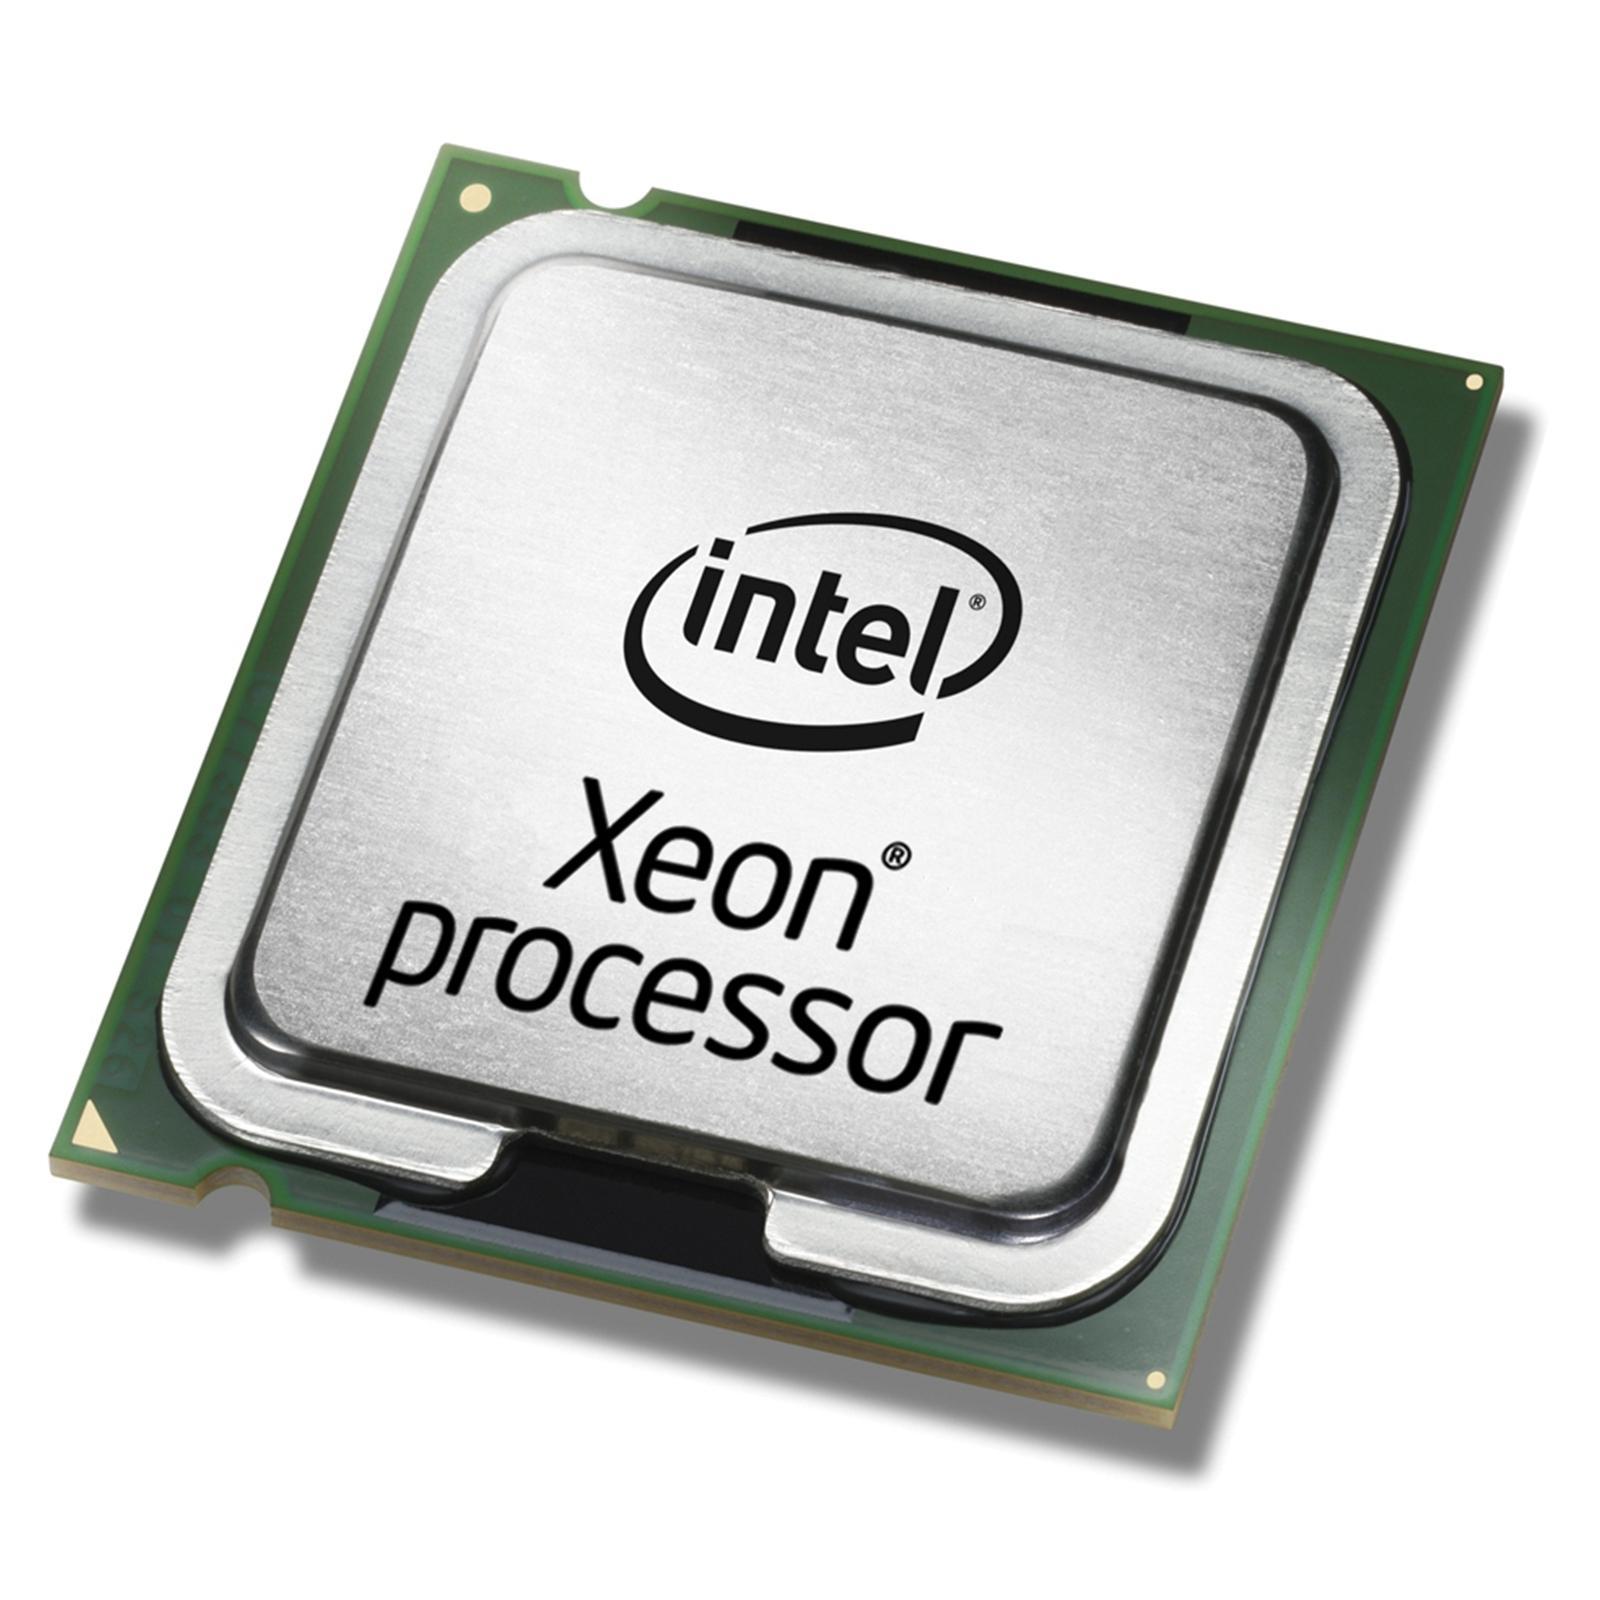 ThinkServer TD450 Intel Xeon E5-2620 v3 Processor